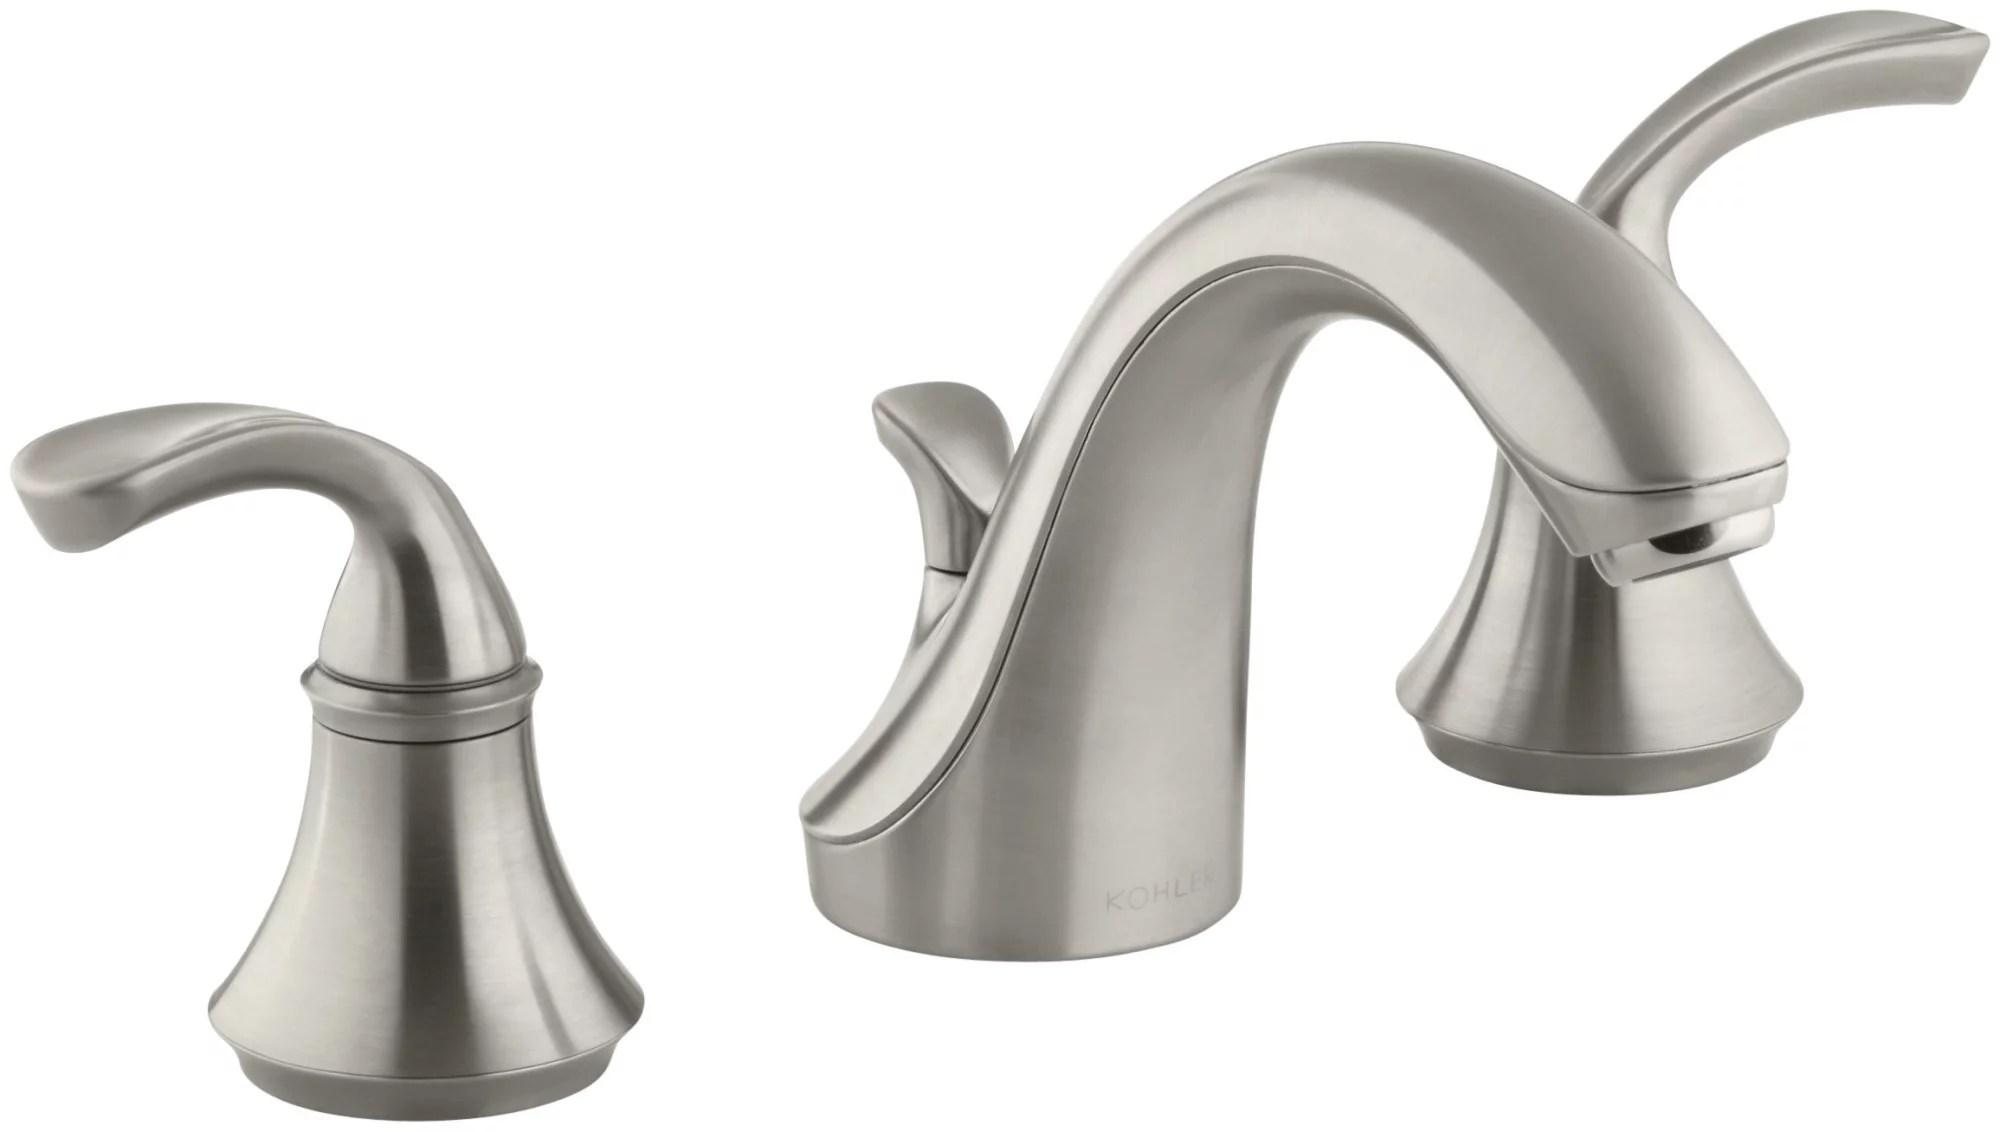 kohler k 10272 4 forte widespread bathroom faucet